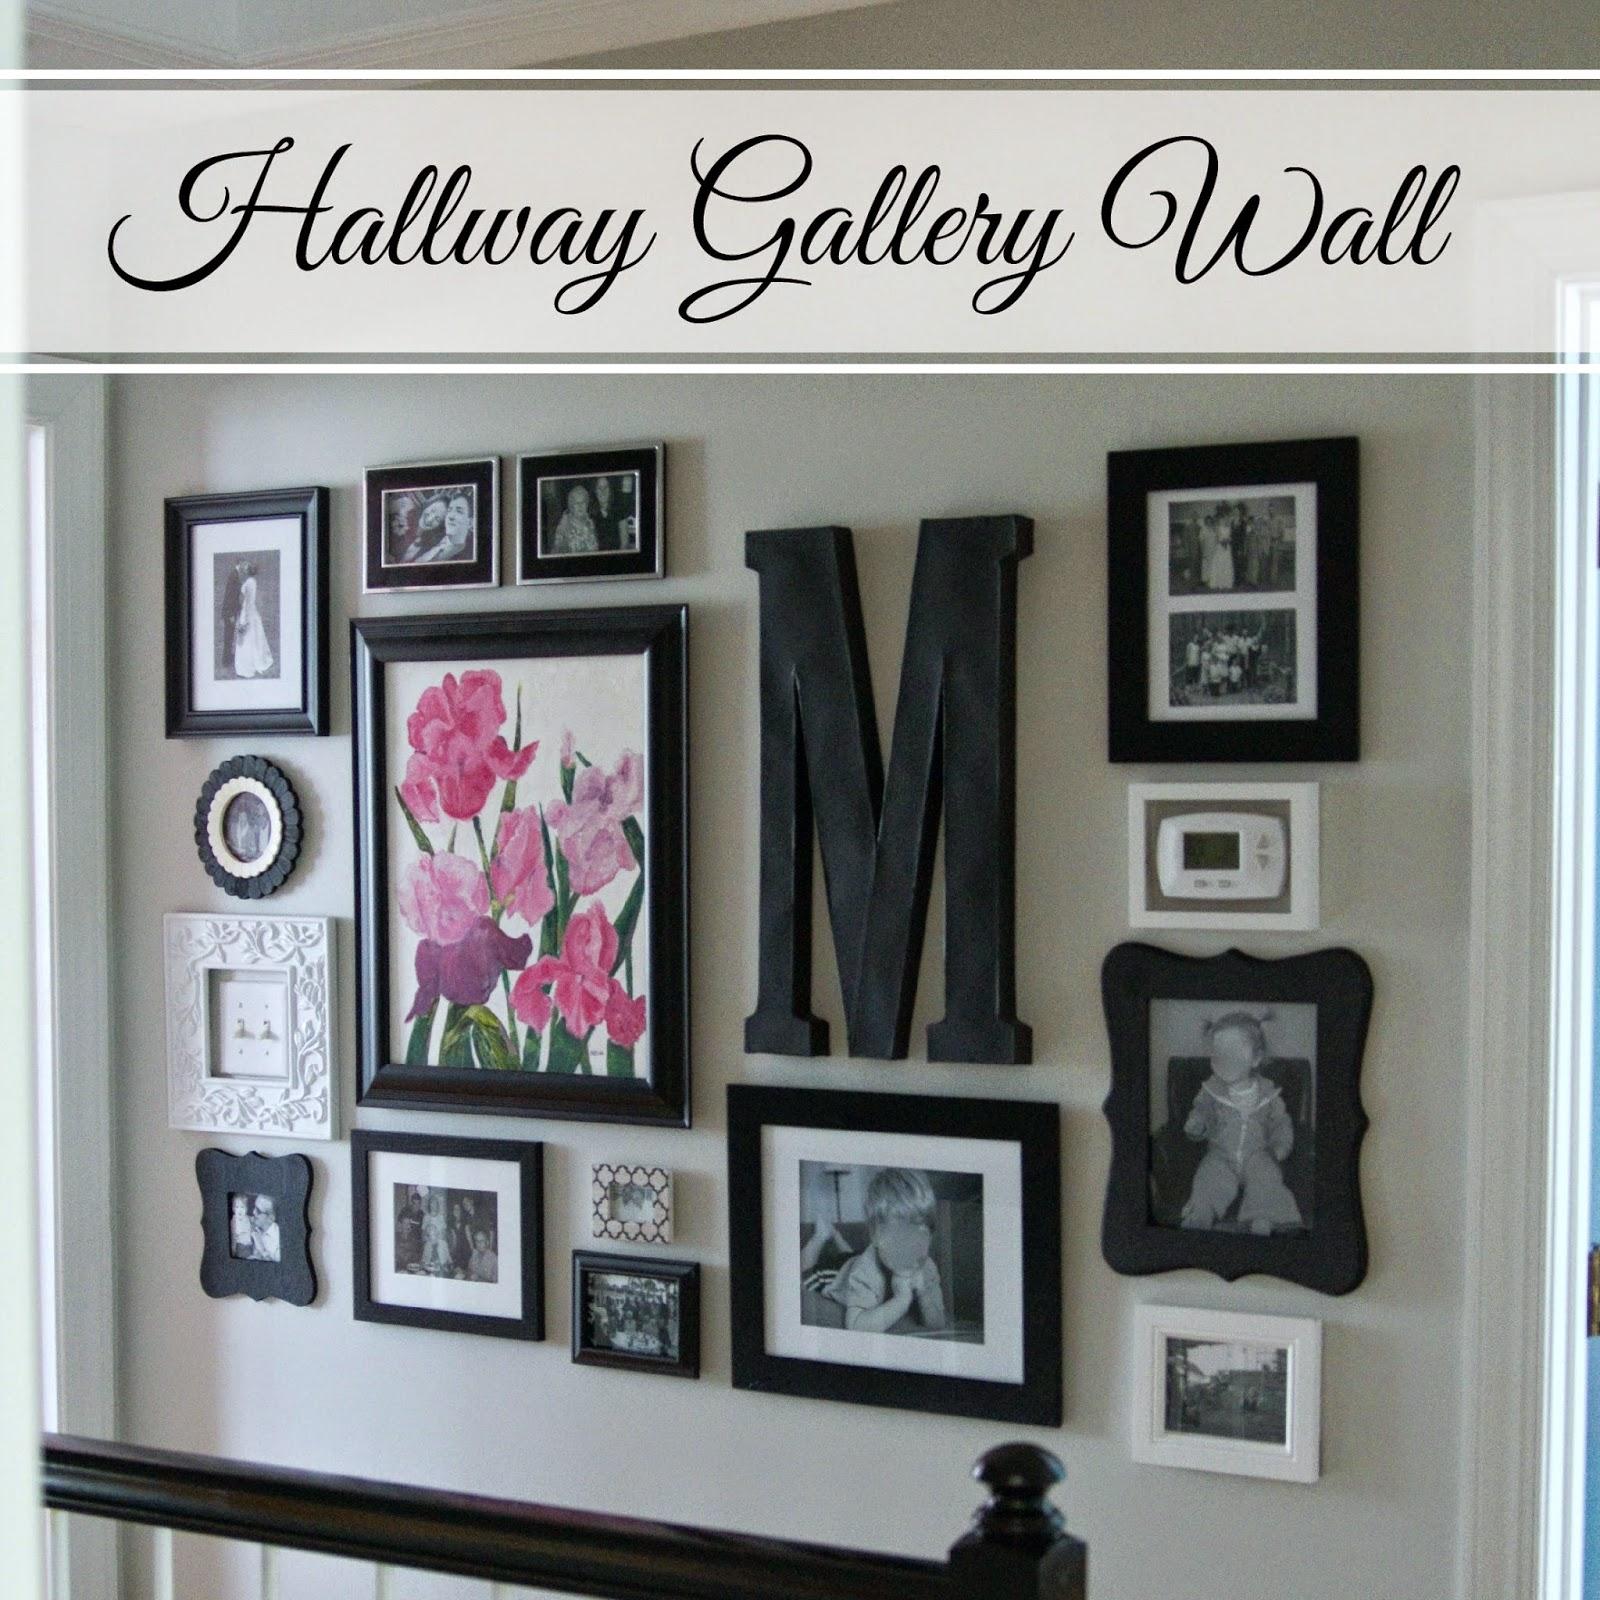 Hallway Gallery Wall